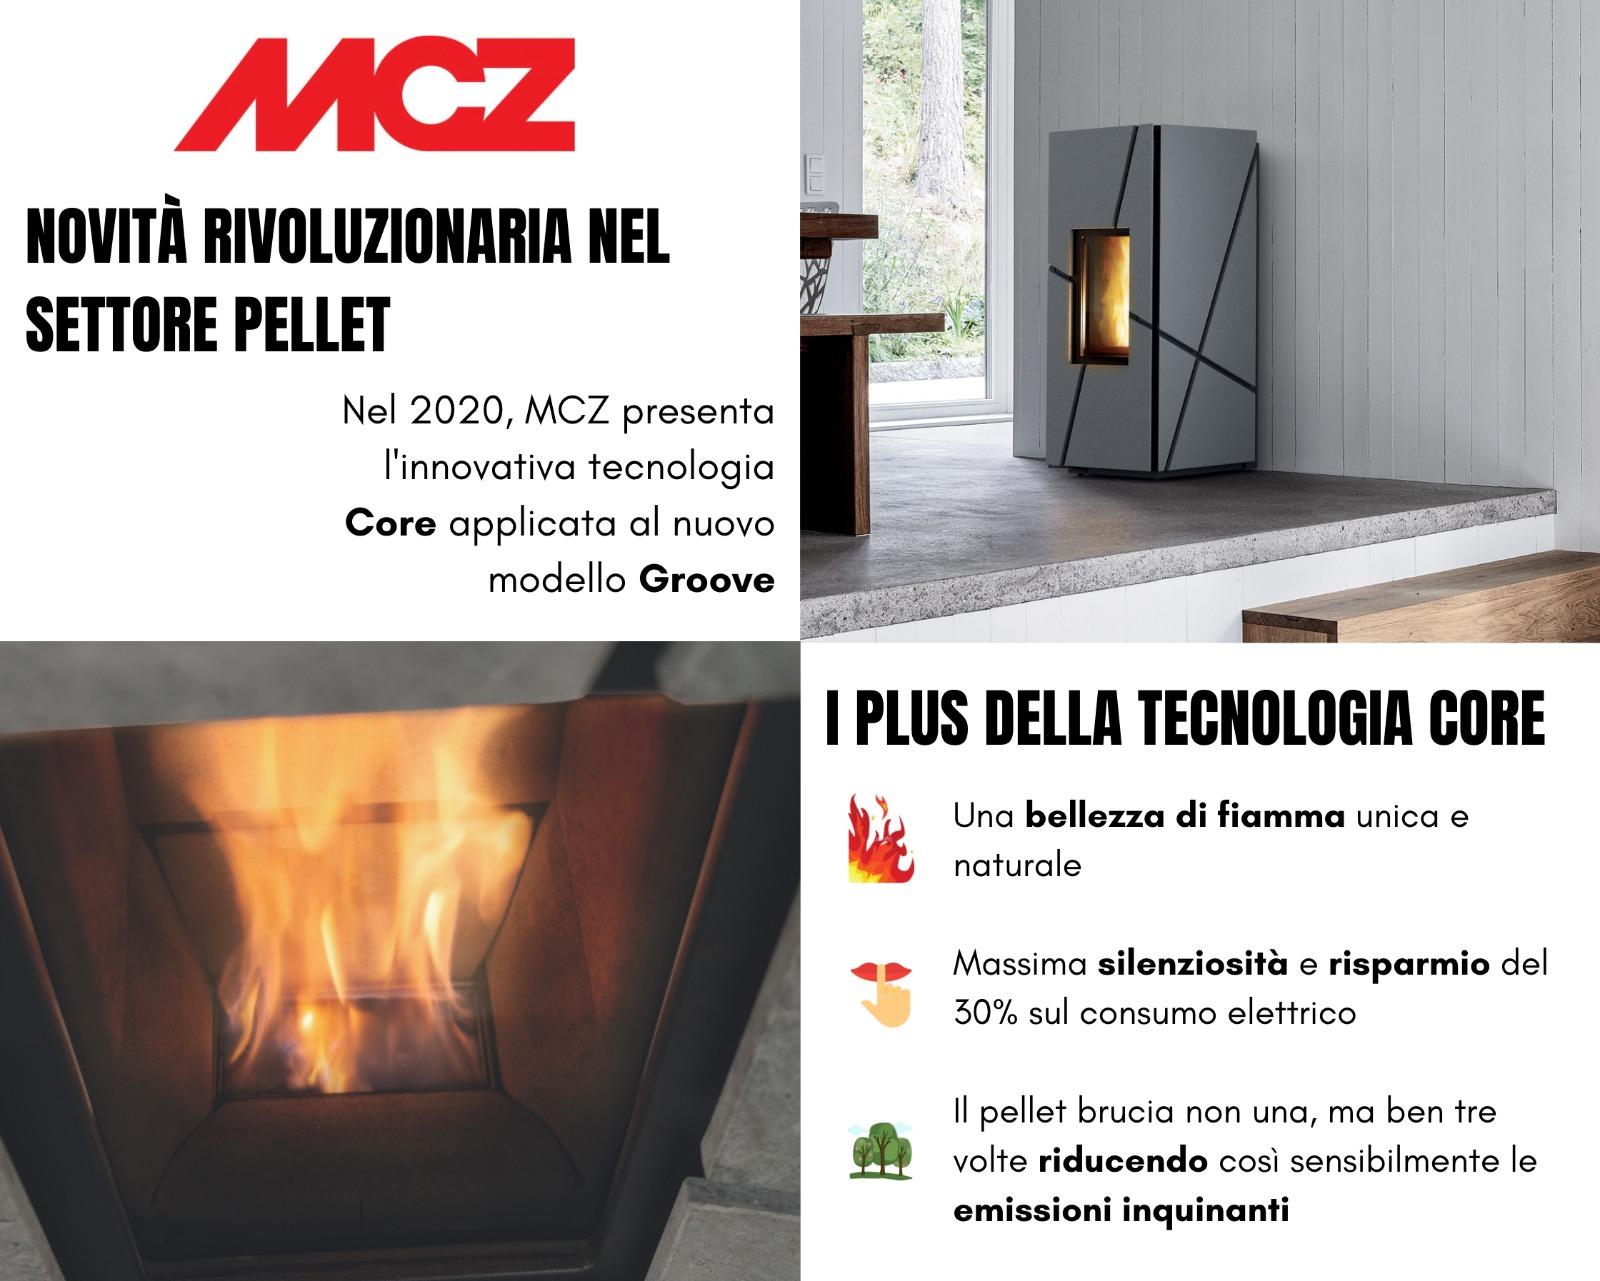 MCZ tecnologia core